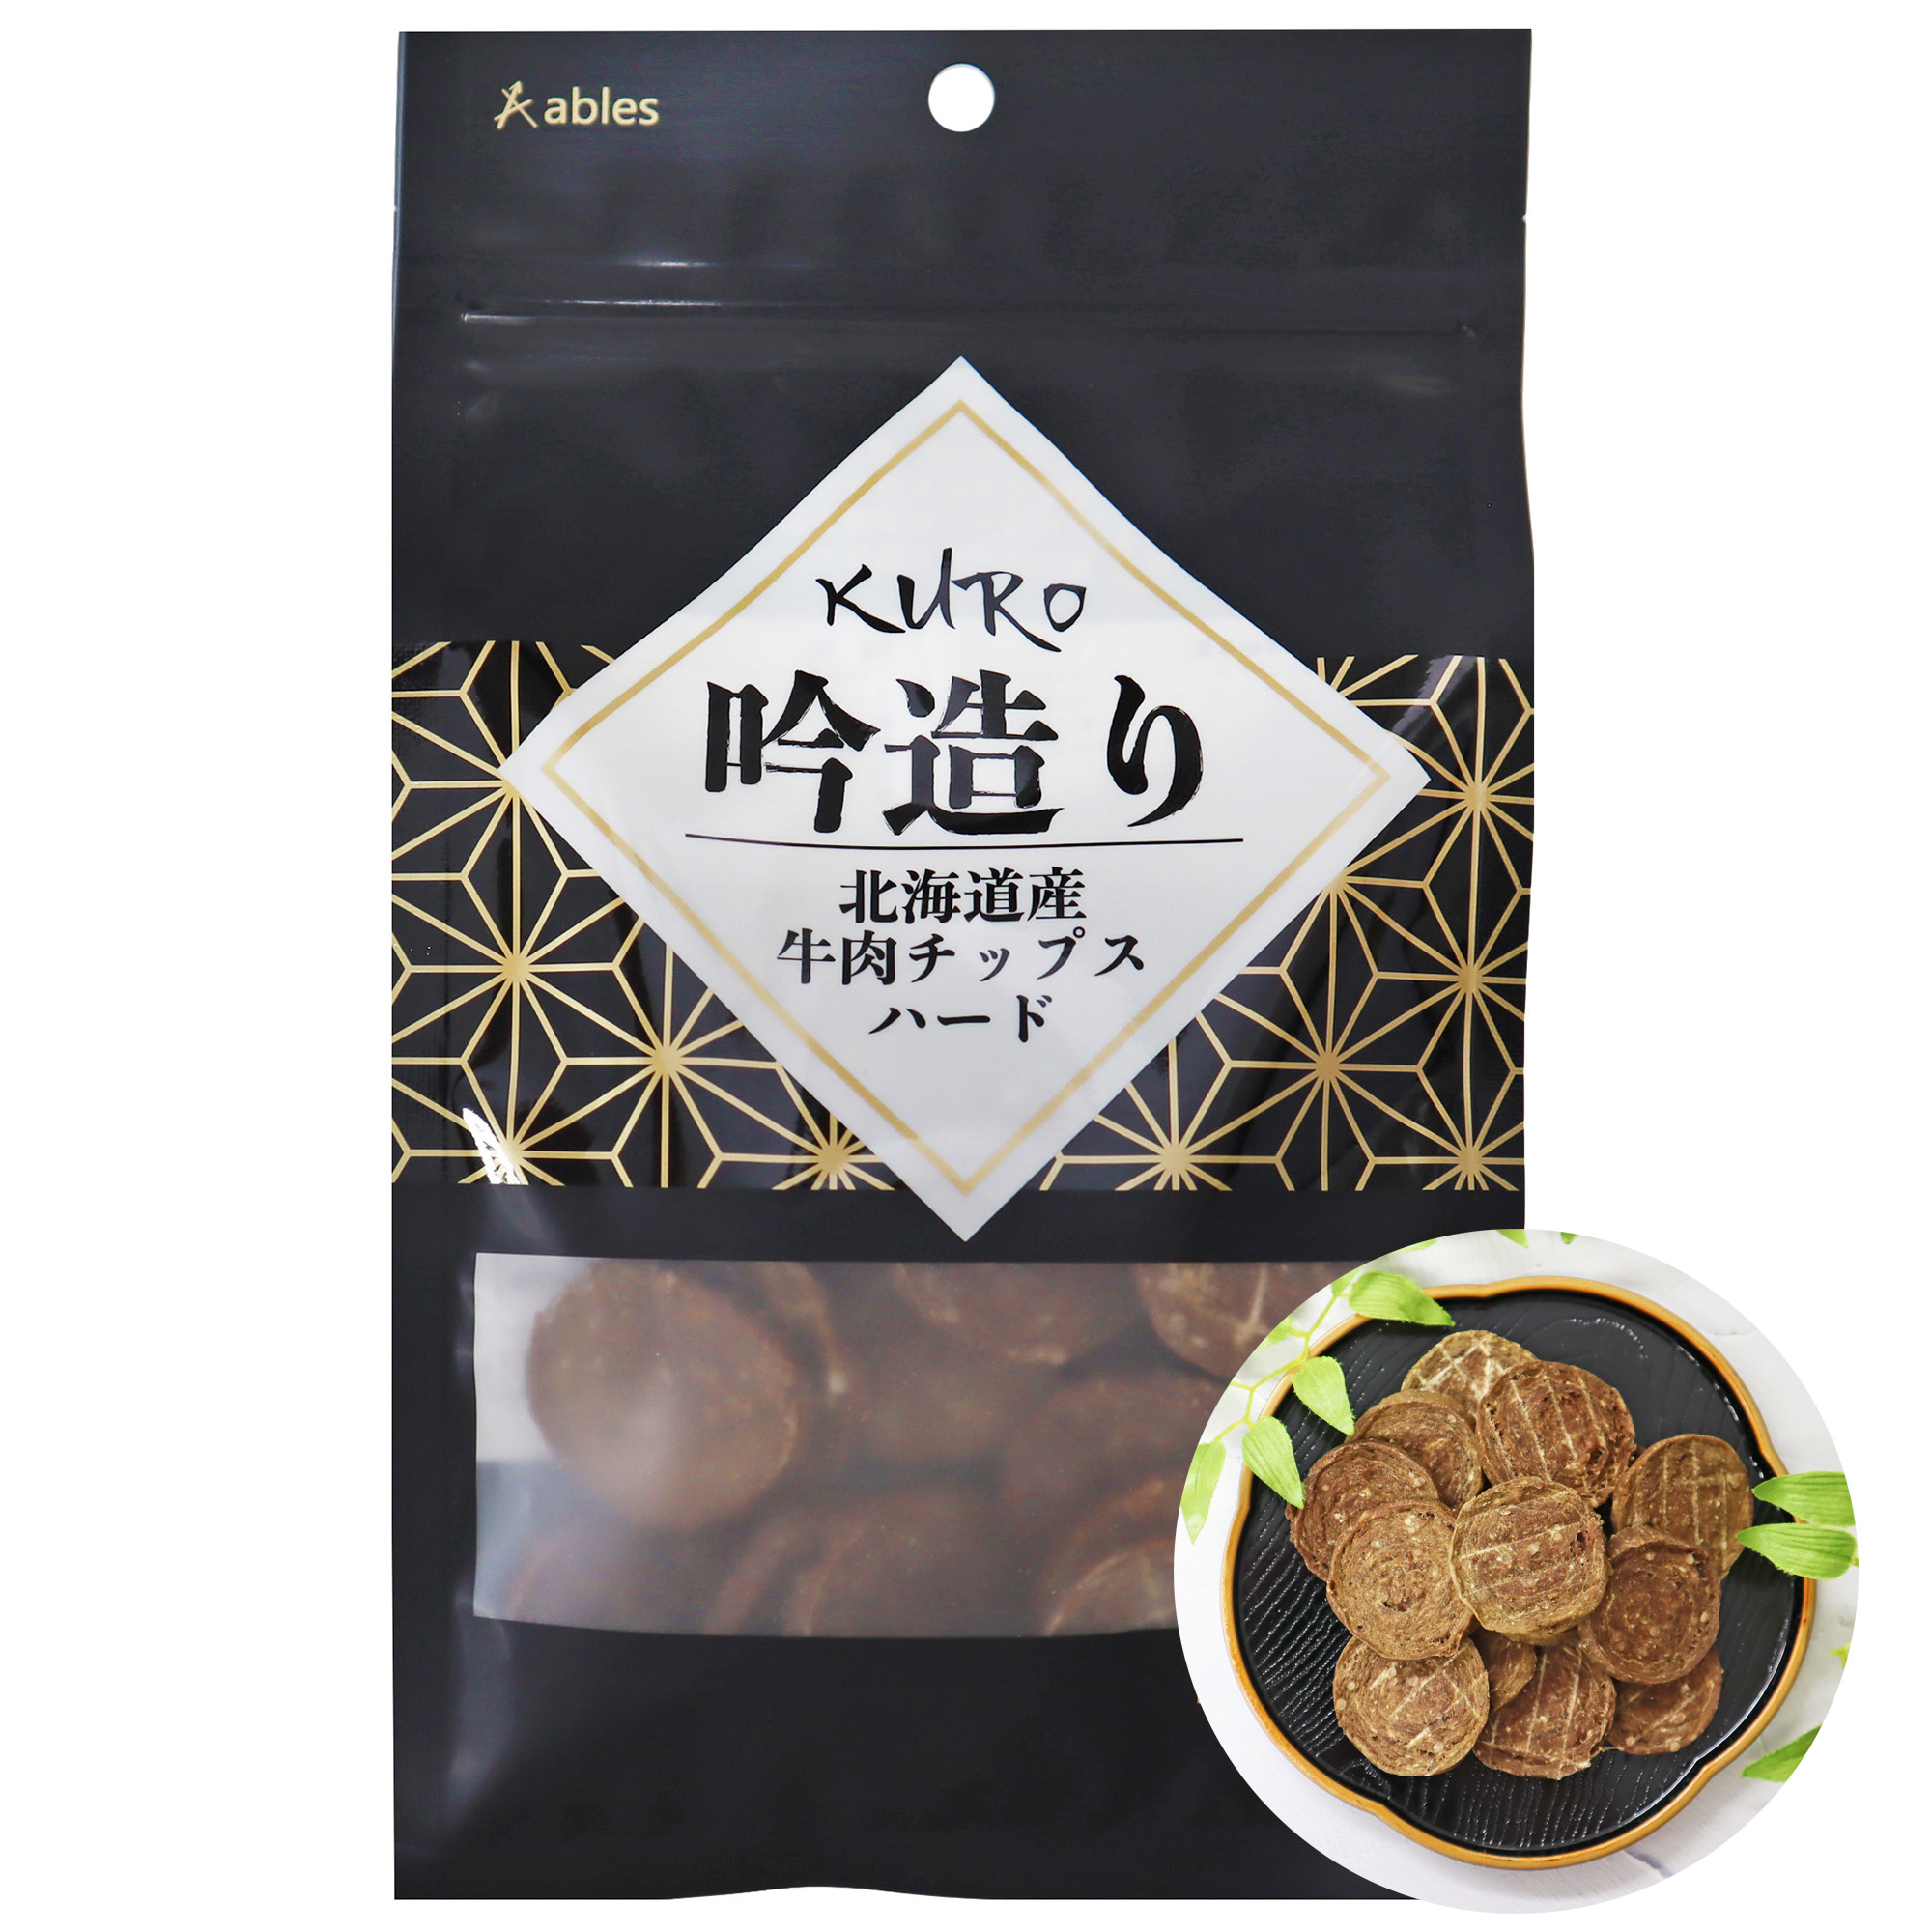 KURO 吟造り 北海道産牛肉チップスハード 50g